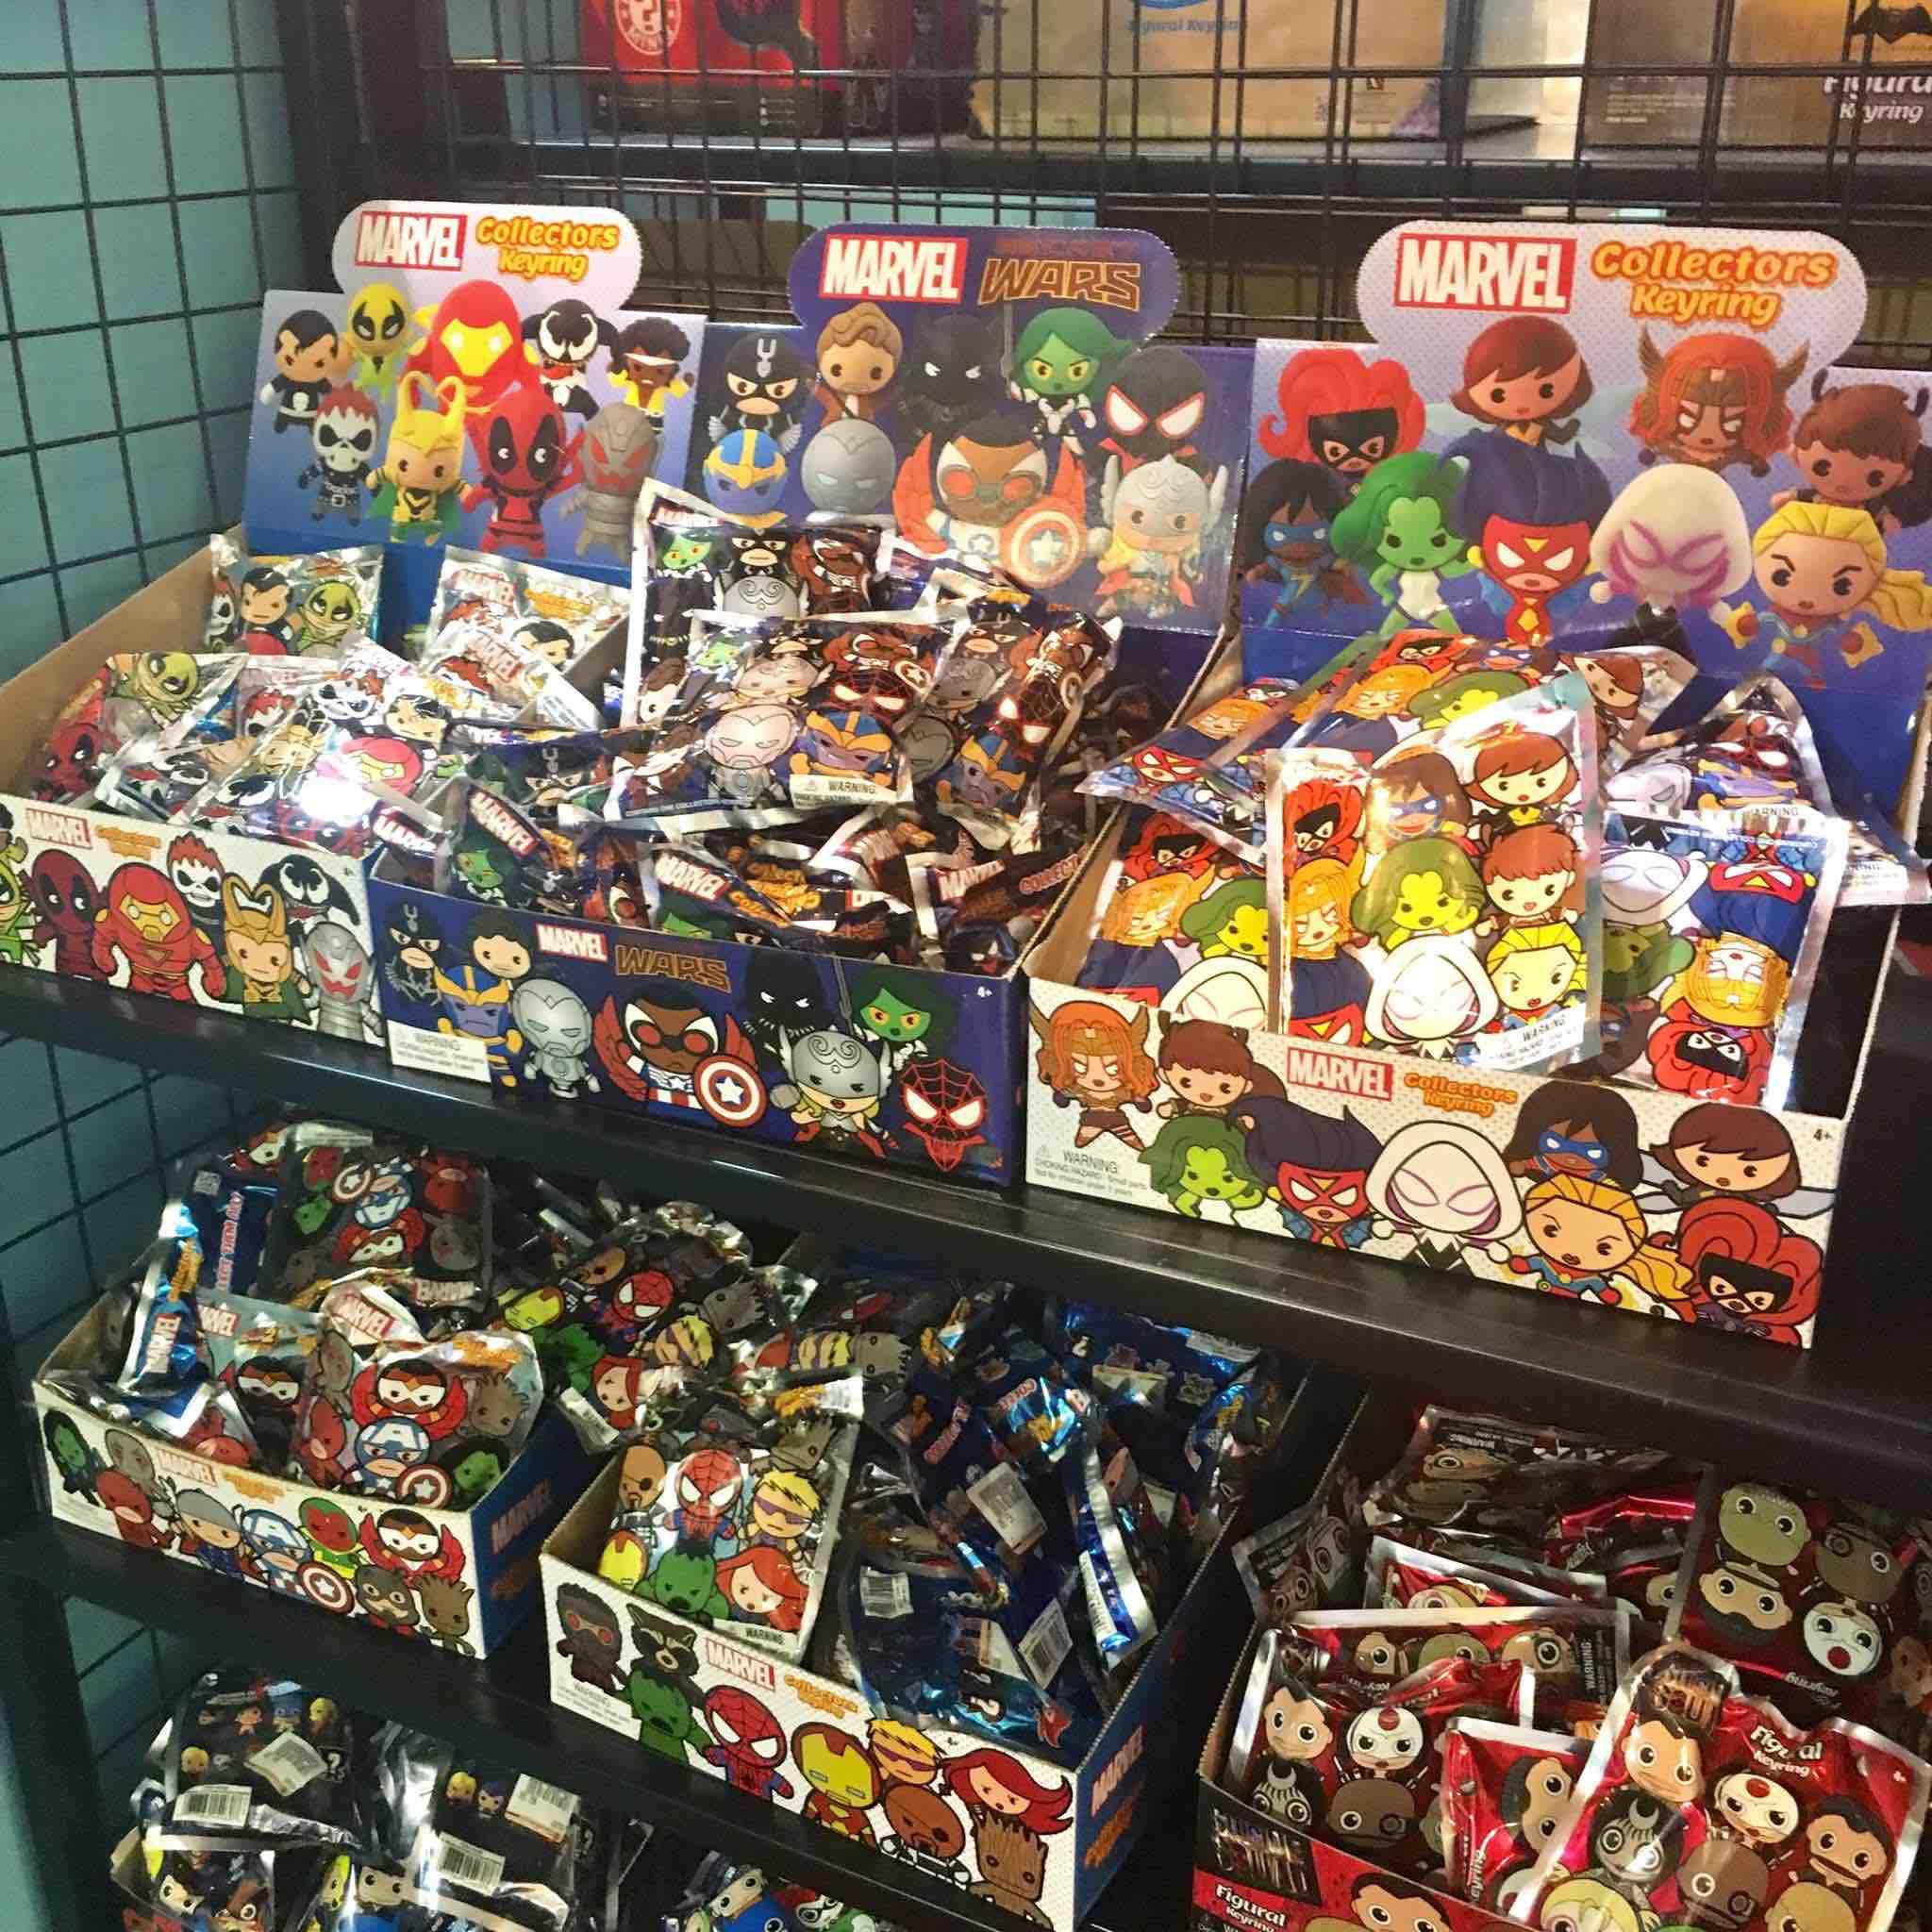 Takashimaya Singapore 21st Craziest Toys Sale Promotion 28 Jul - 6 Aug 2017   Why Not Deals 3 & Promotions